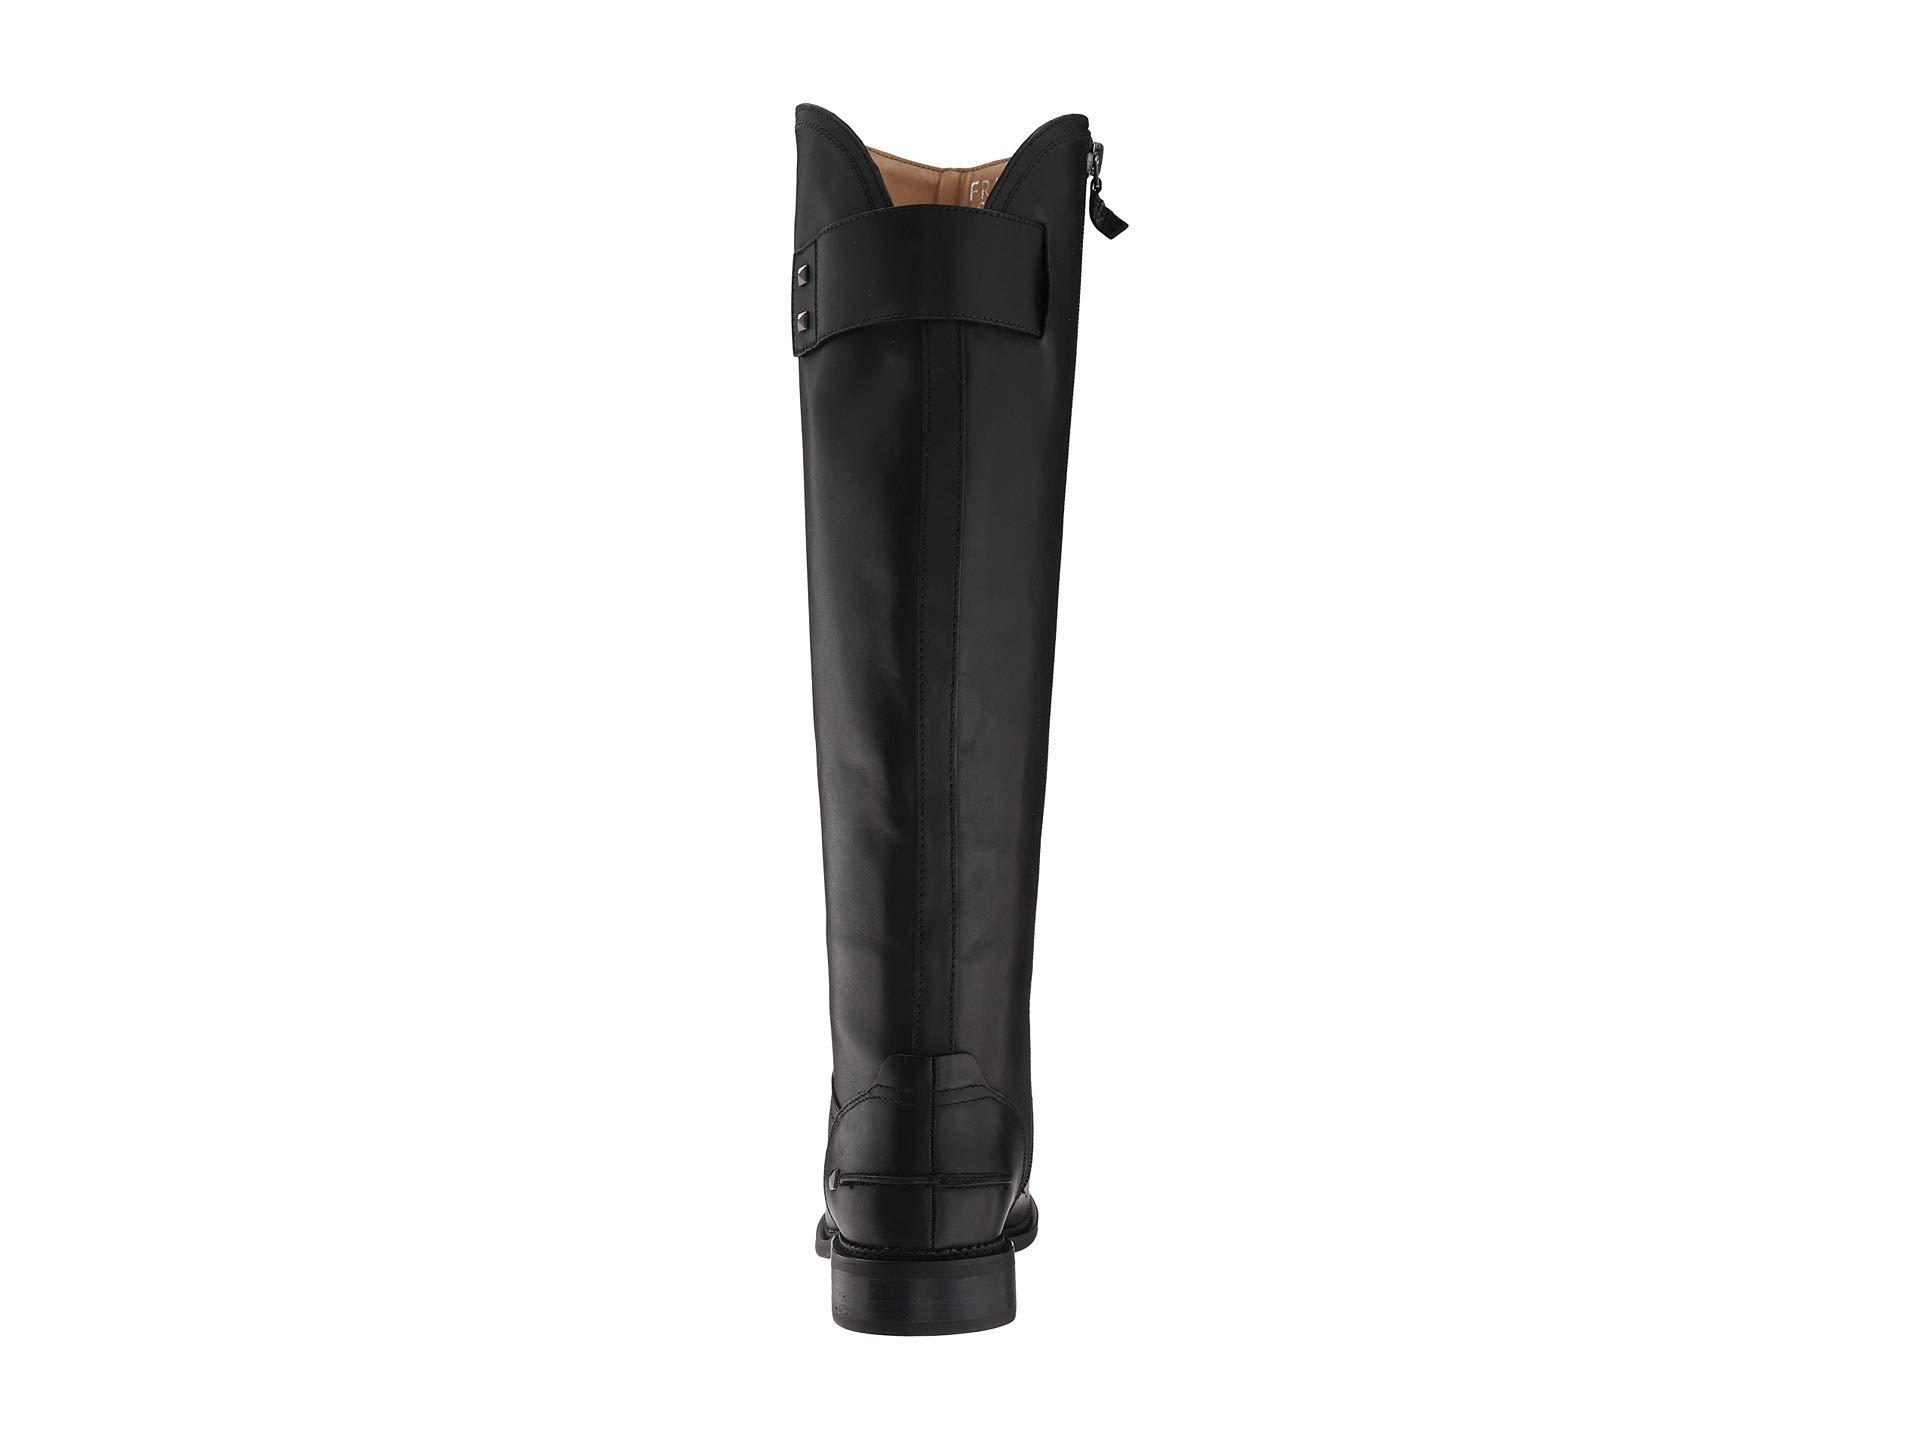 Franco Henrietta Black Sarto Premium Bally Leather rUpWr7nA